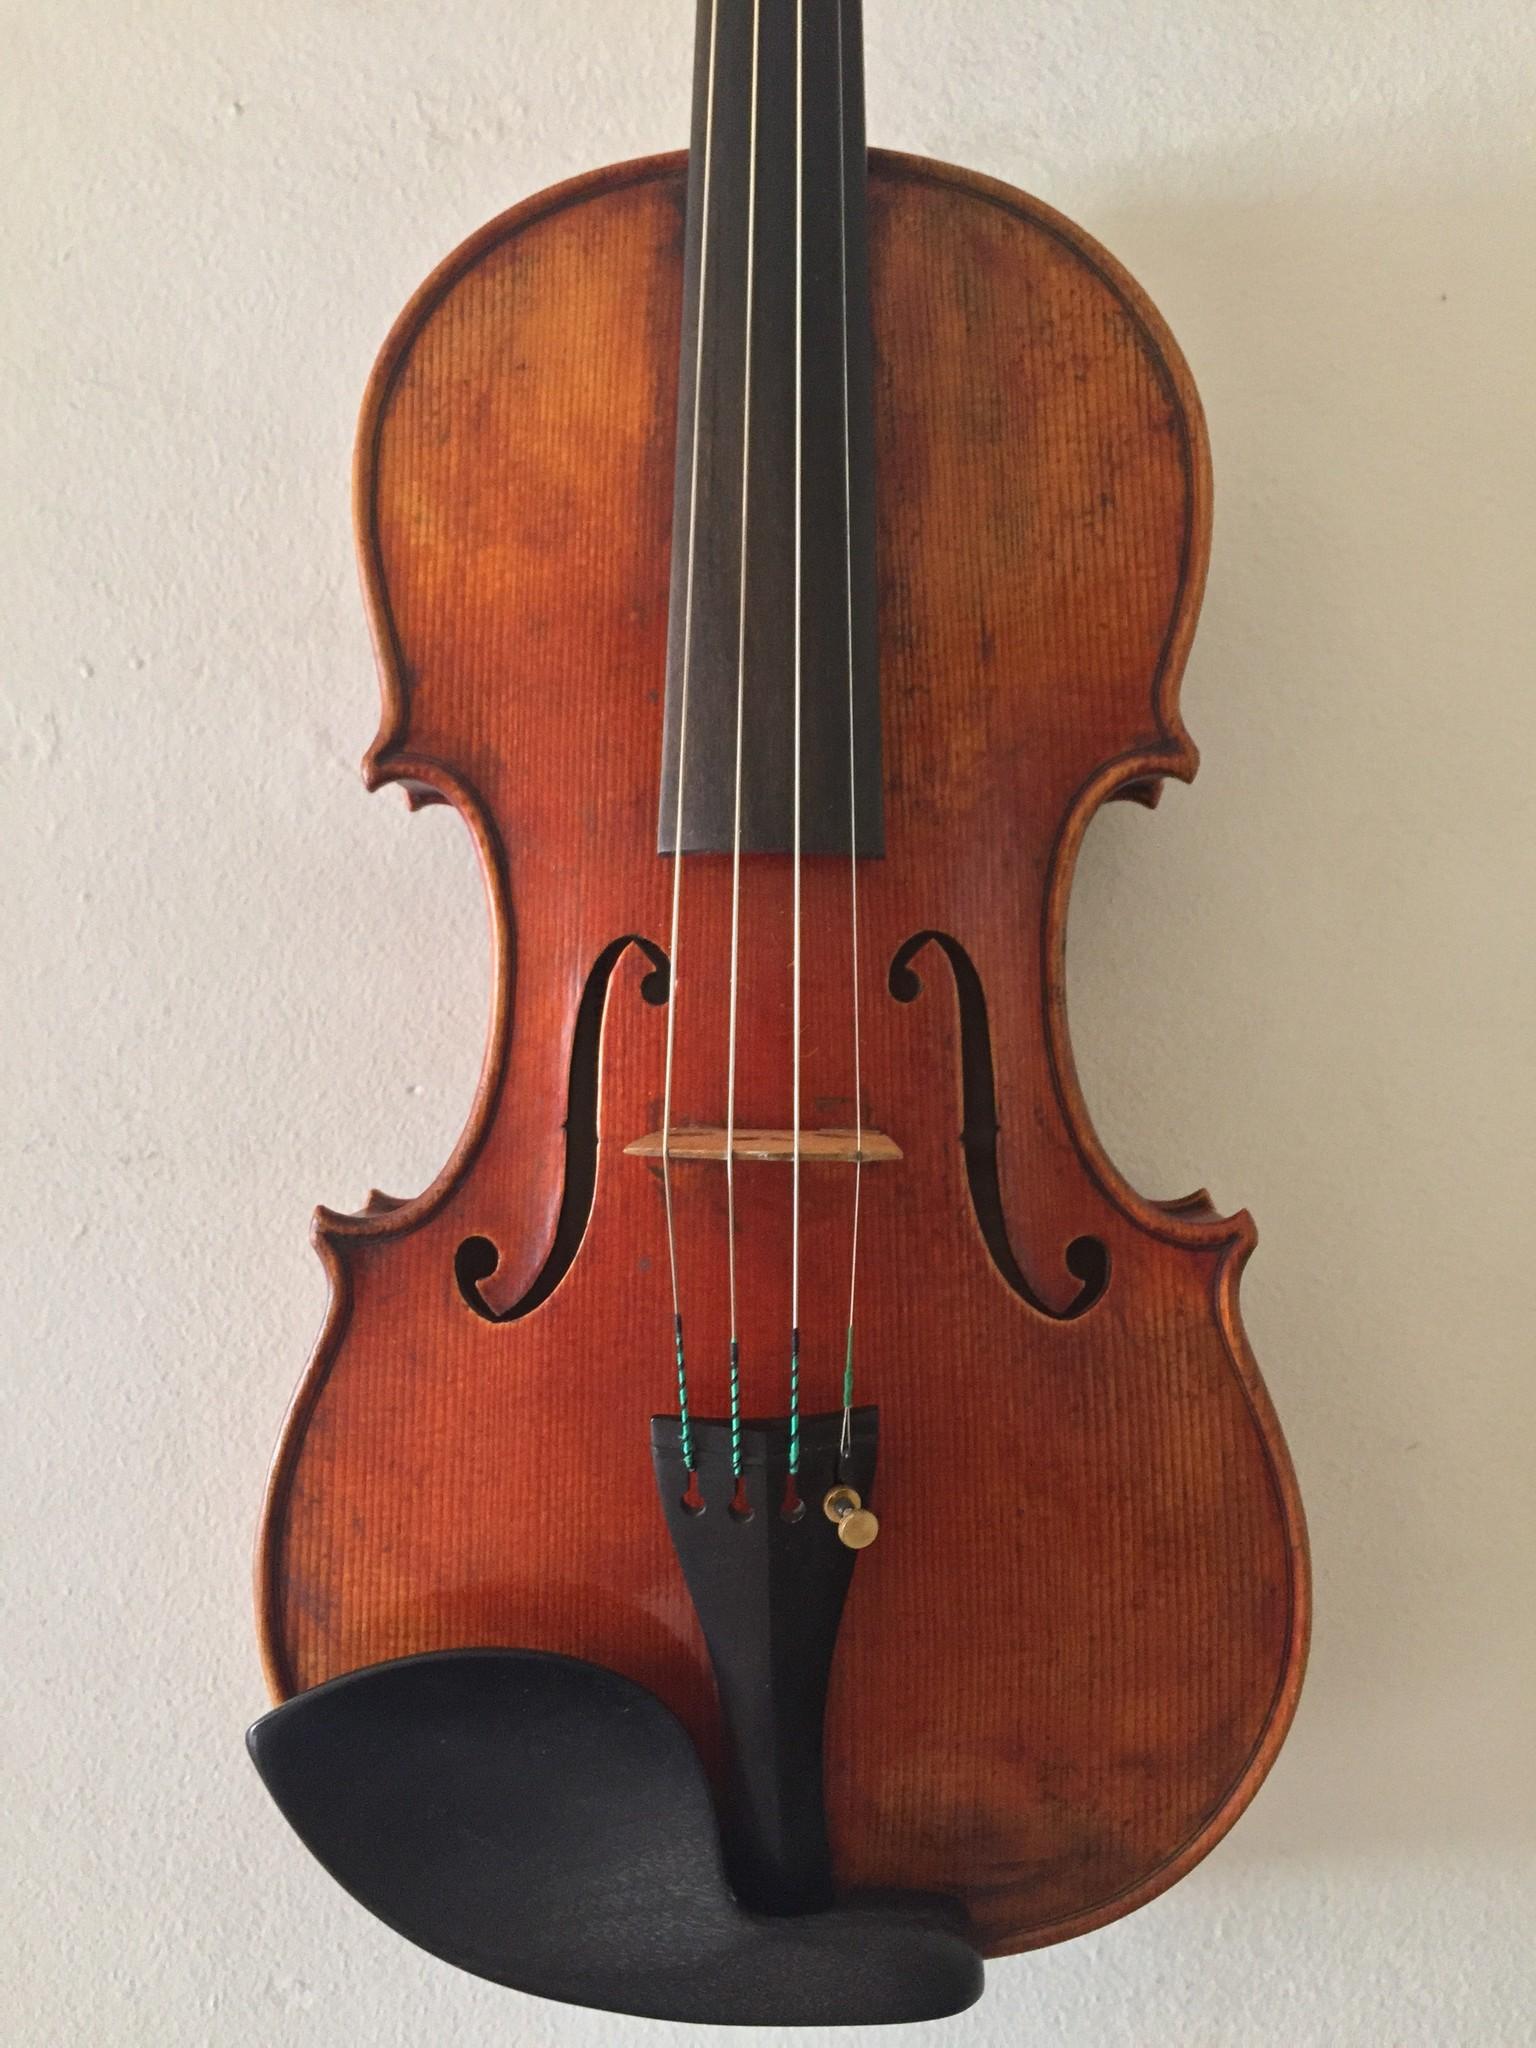 Grubaugh/Seifert violin, Petaluma, California, USA, 1997